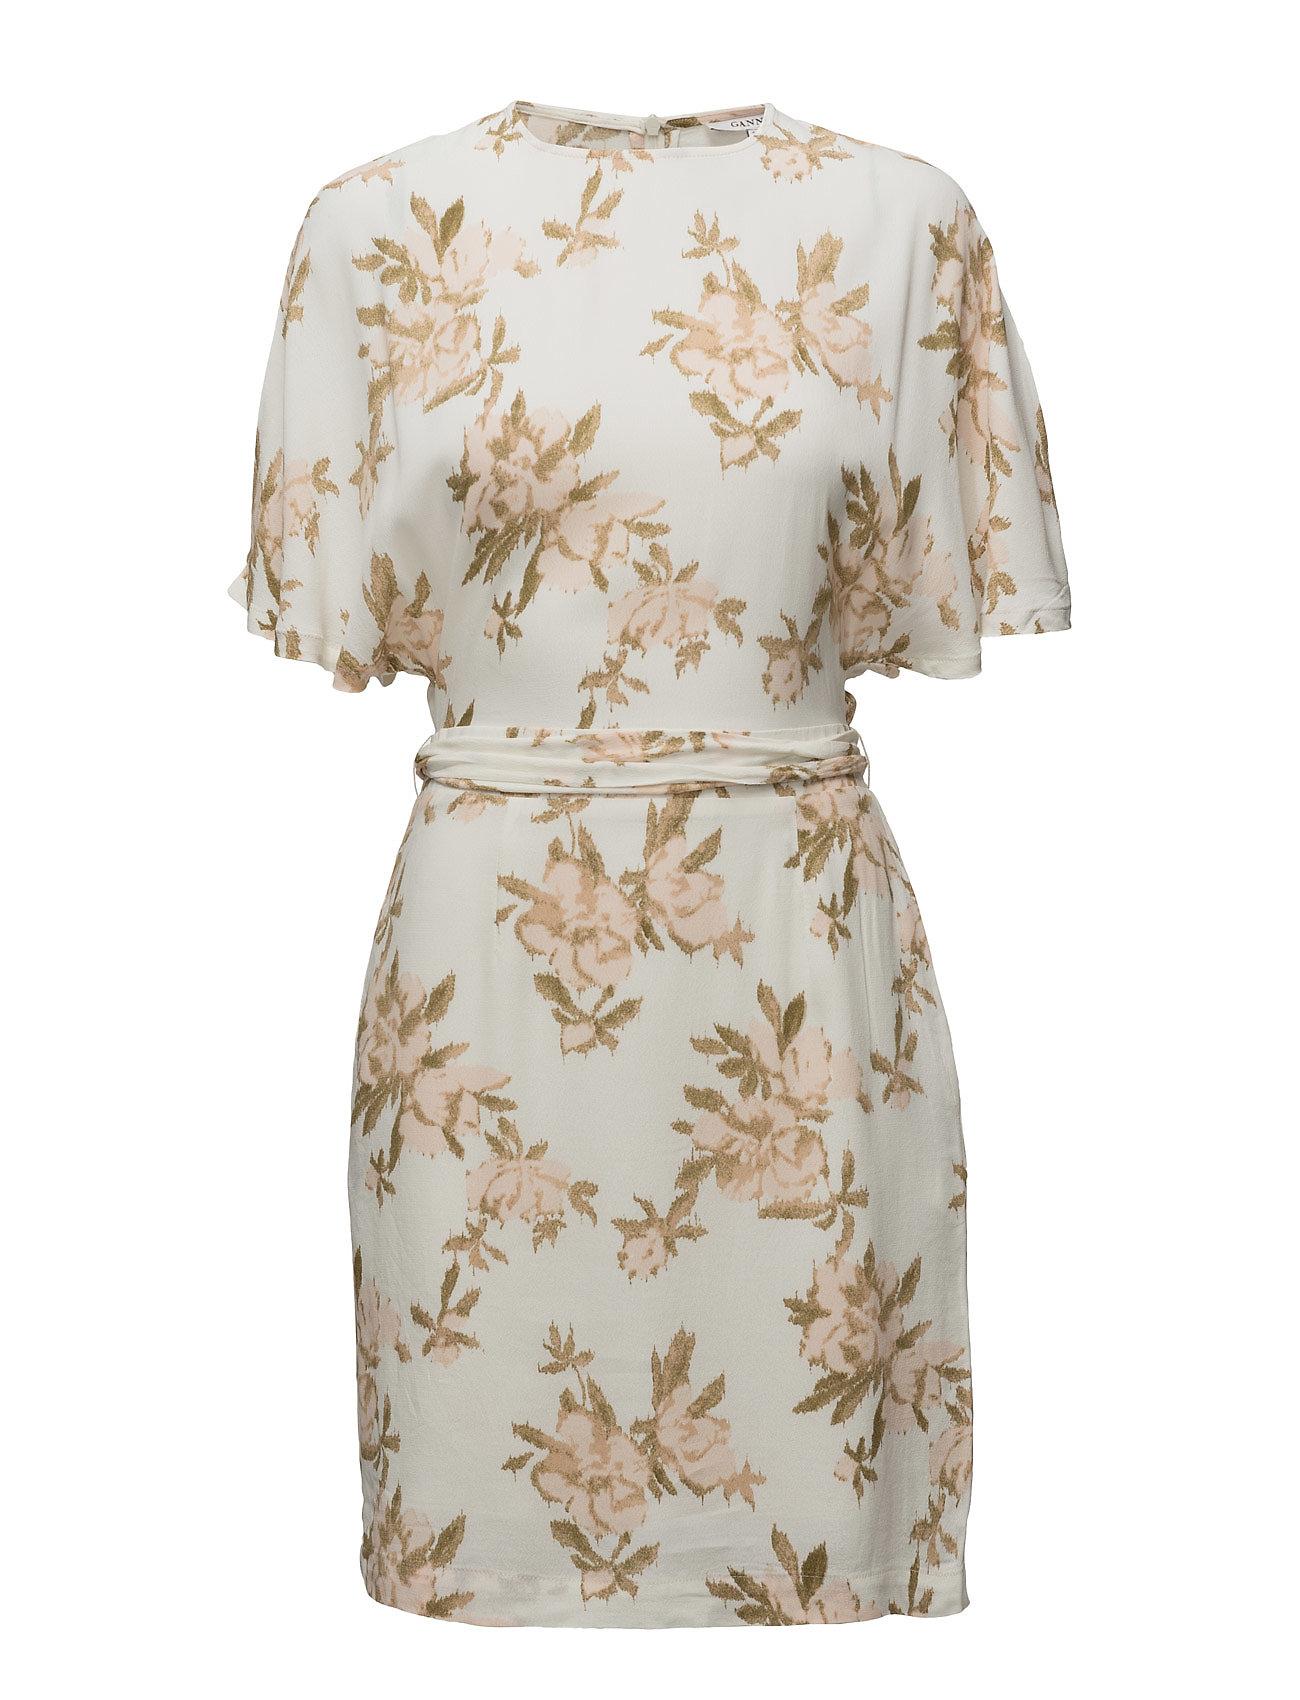 6a724f5f Ganni St. Pierre Crepe Dress (Vanilla Ice), (104 €)   Large ...